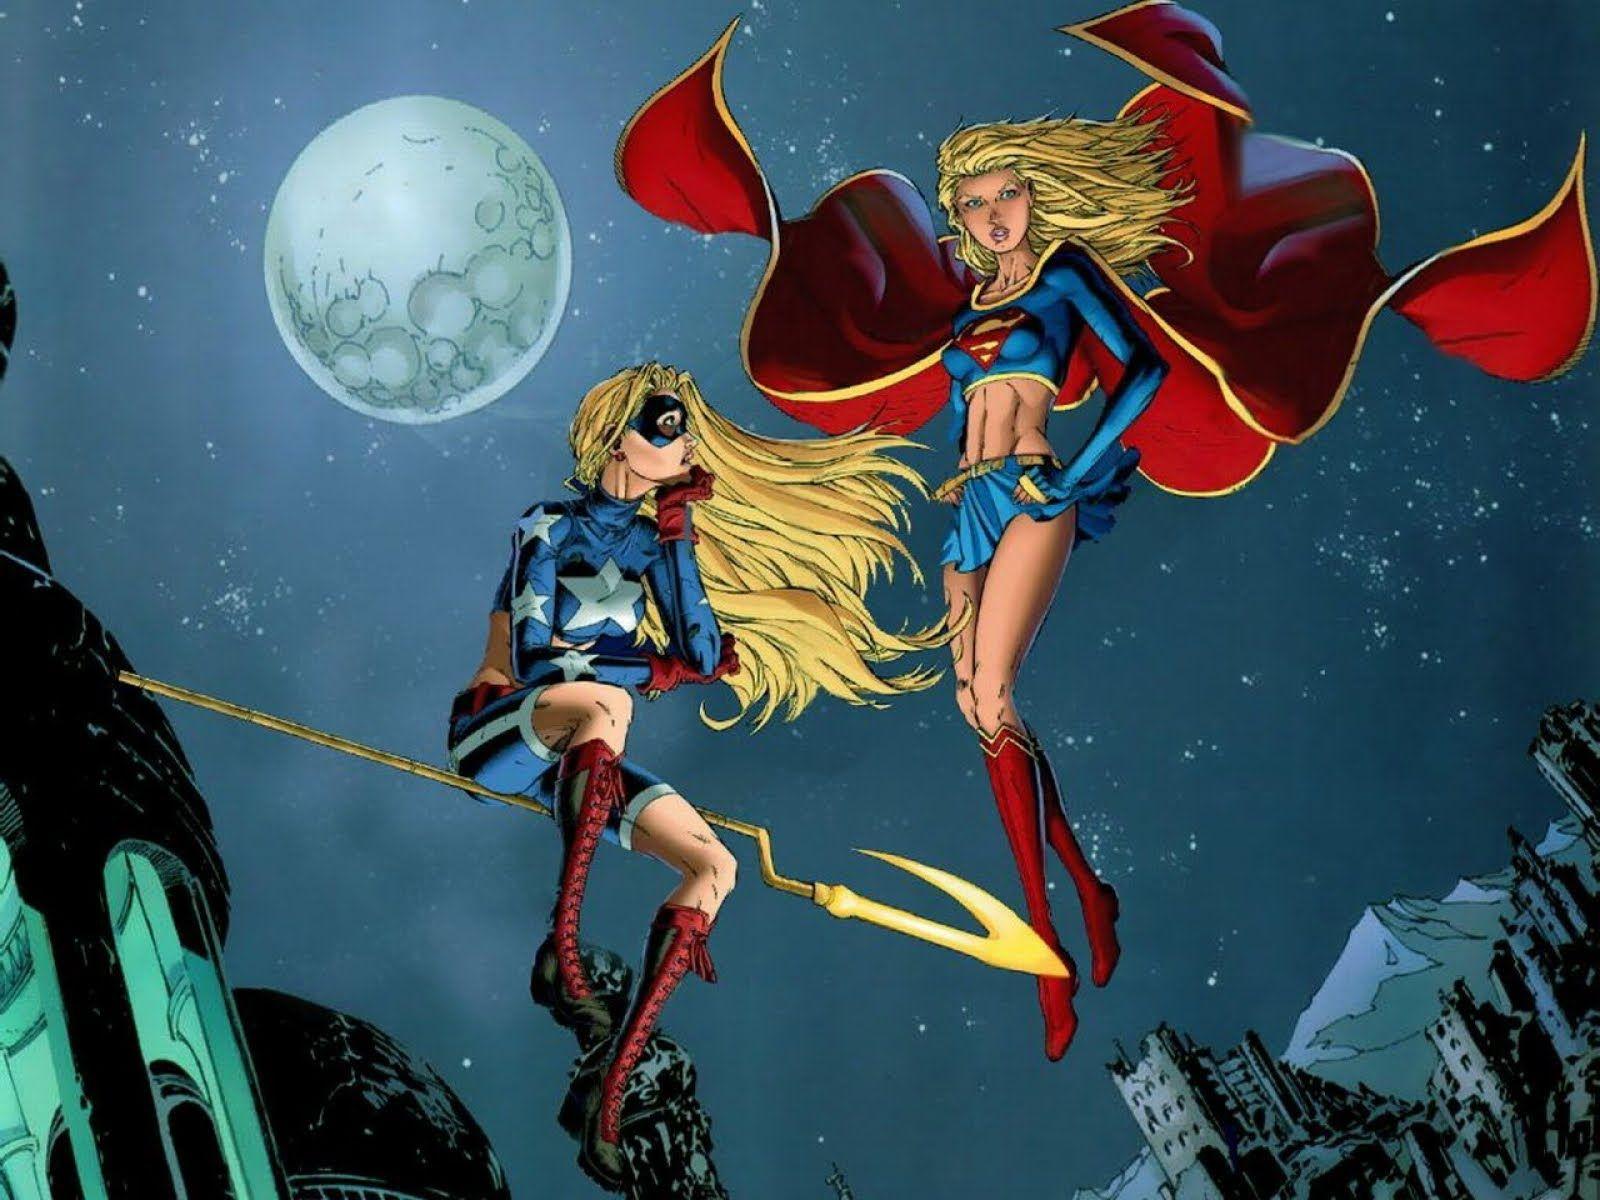 Pin by Jenn A Visual Capsule on Superheroes Supergirl comic 1600x1200